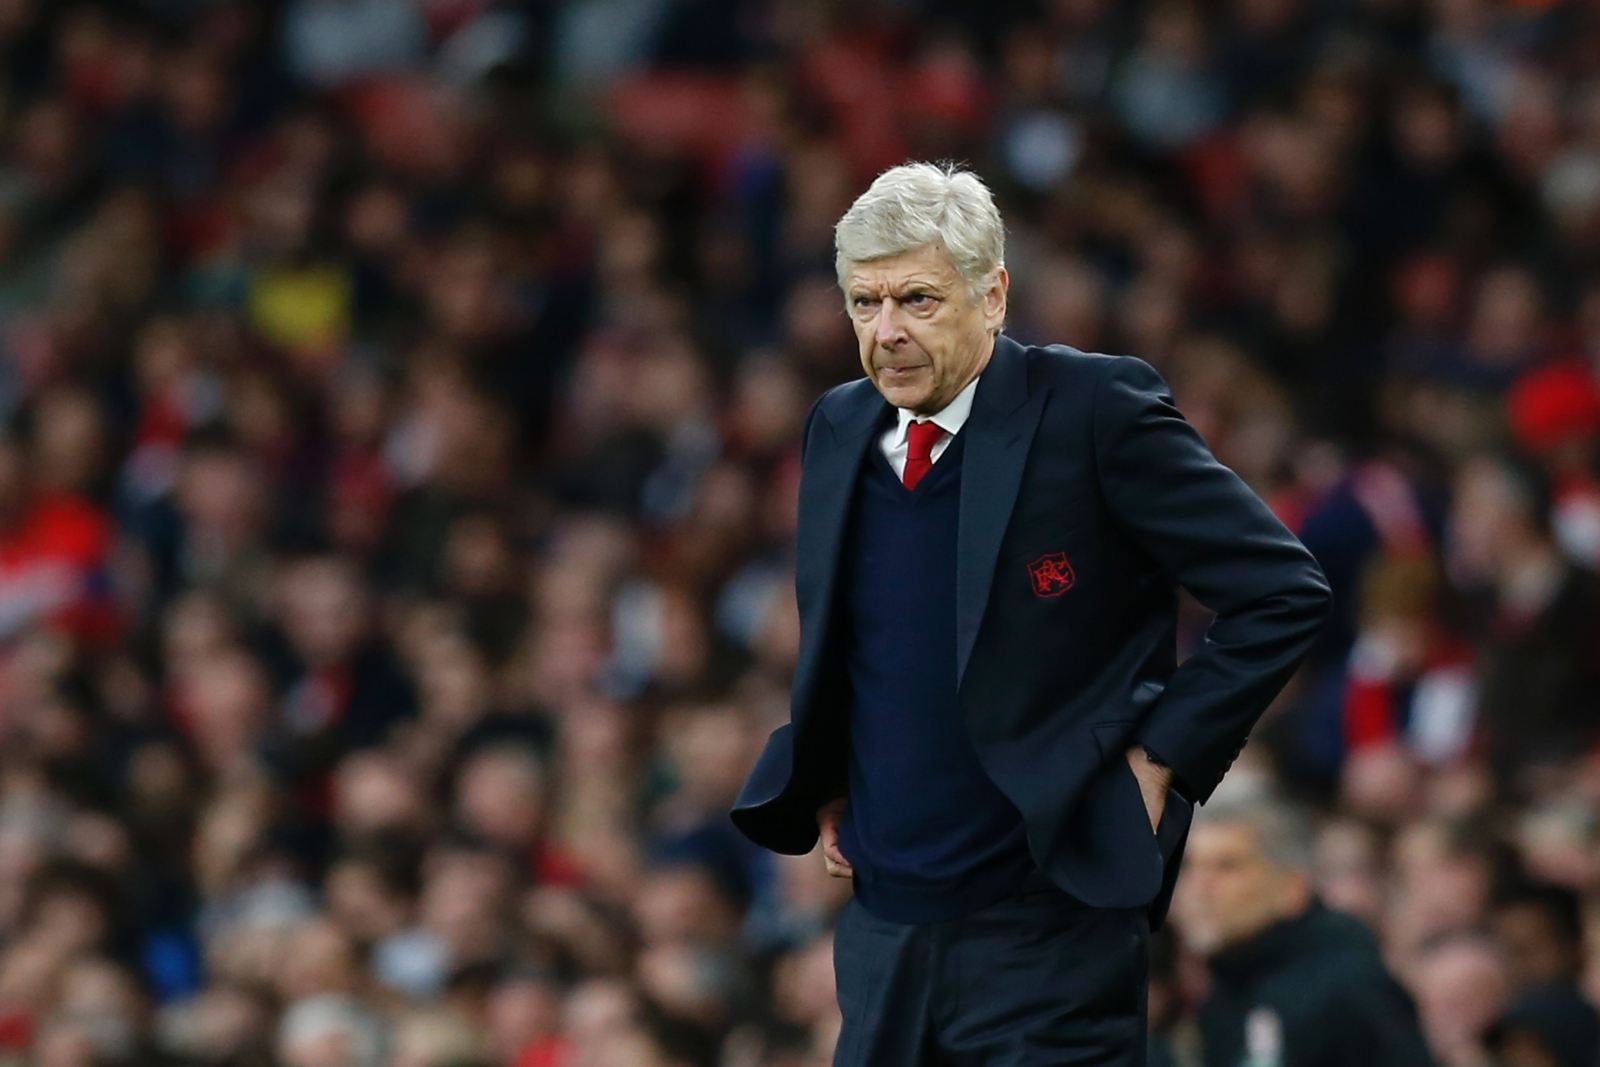 Arsene Wenger looks frustrated on the touchline